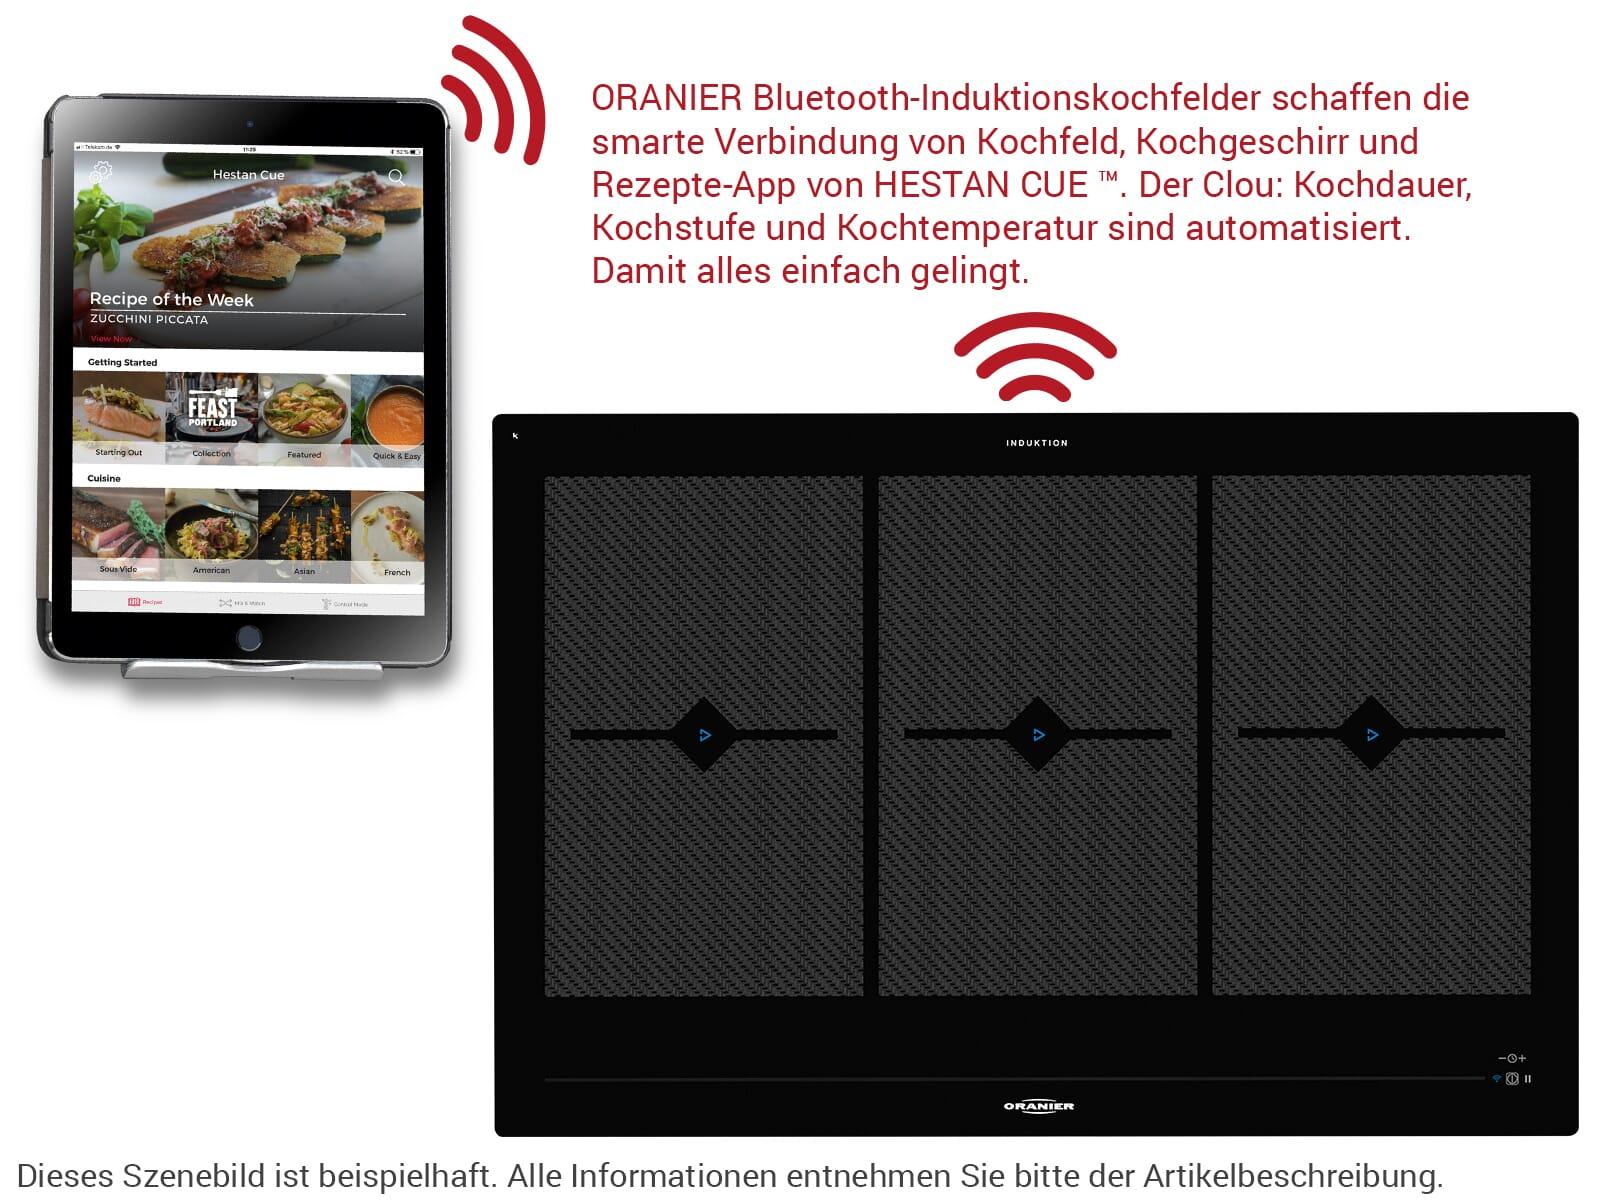 Oranier Clever-Set 41 - 9905 41 Backofen EBS 9936 + Induktionskochfeld FLI 2088 bc